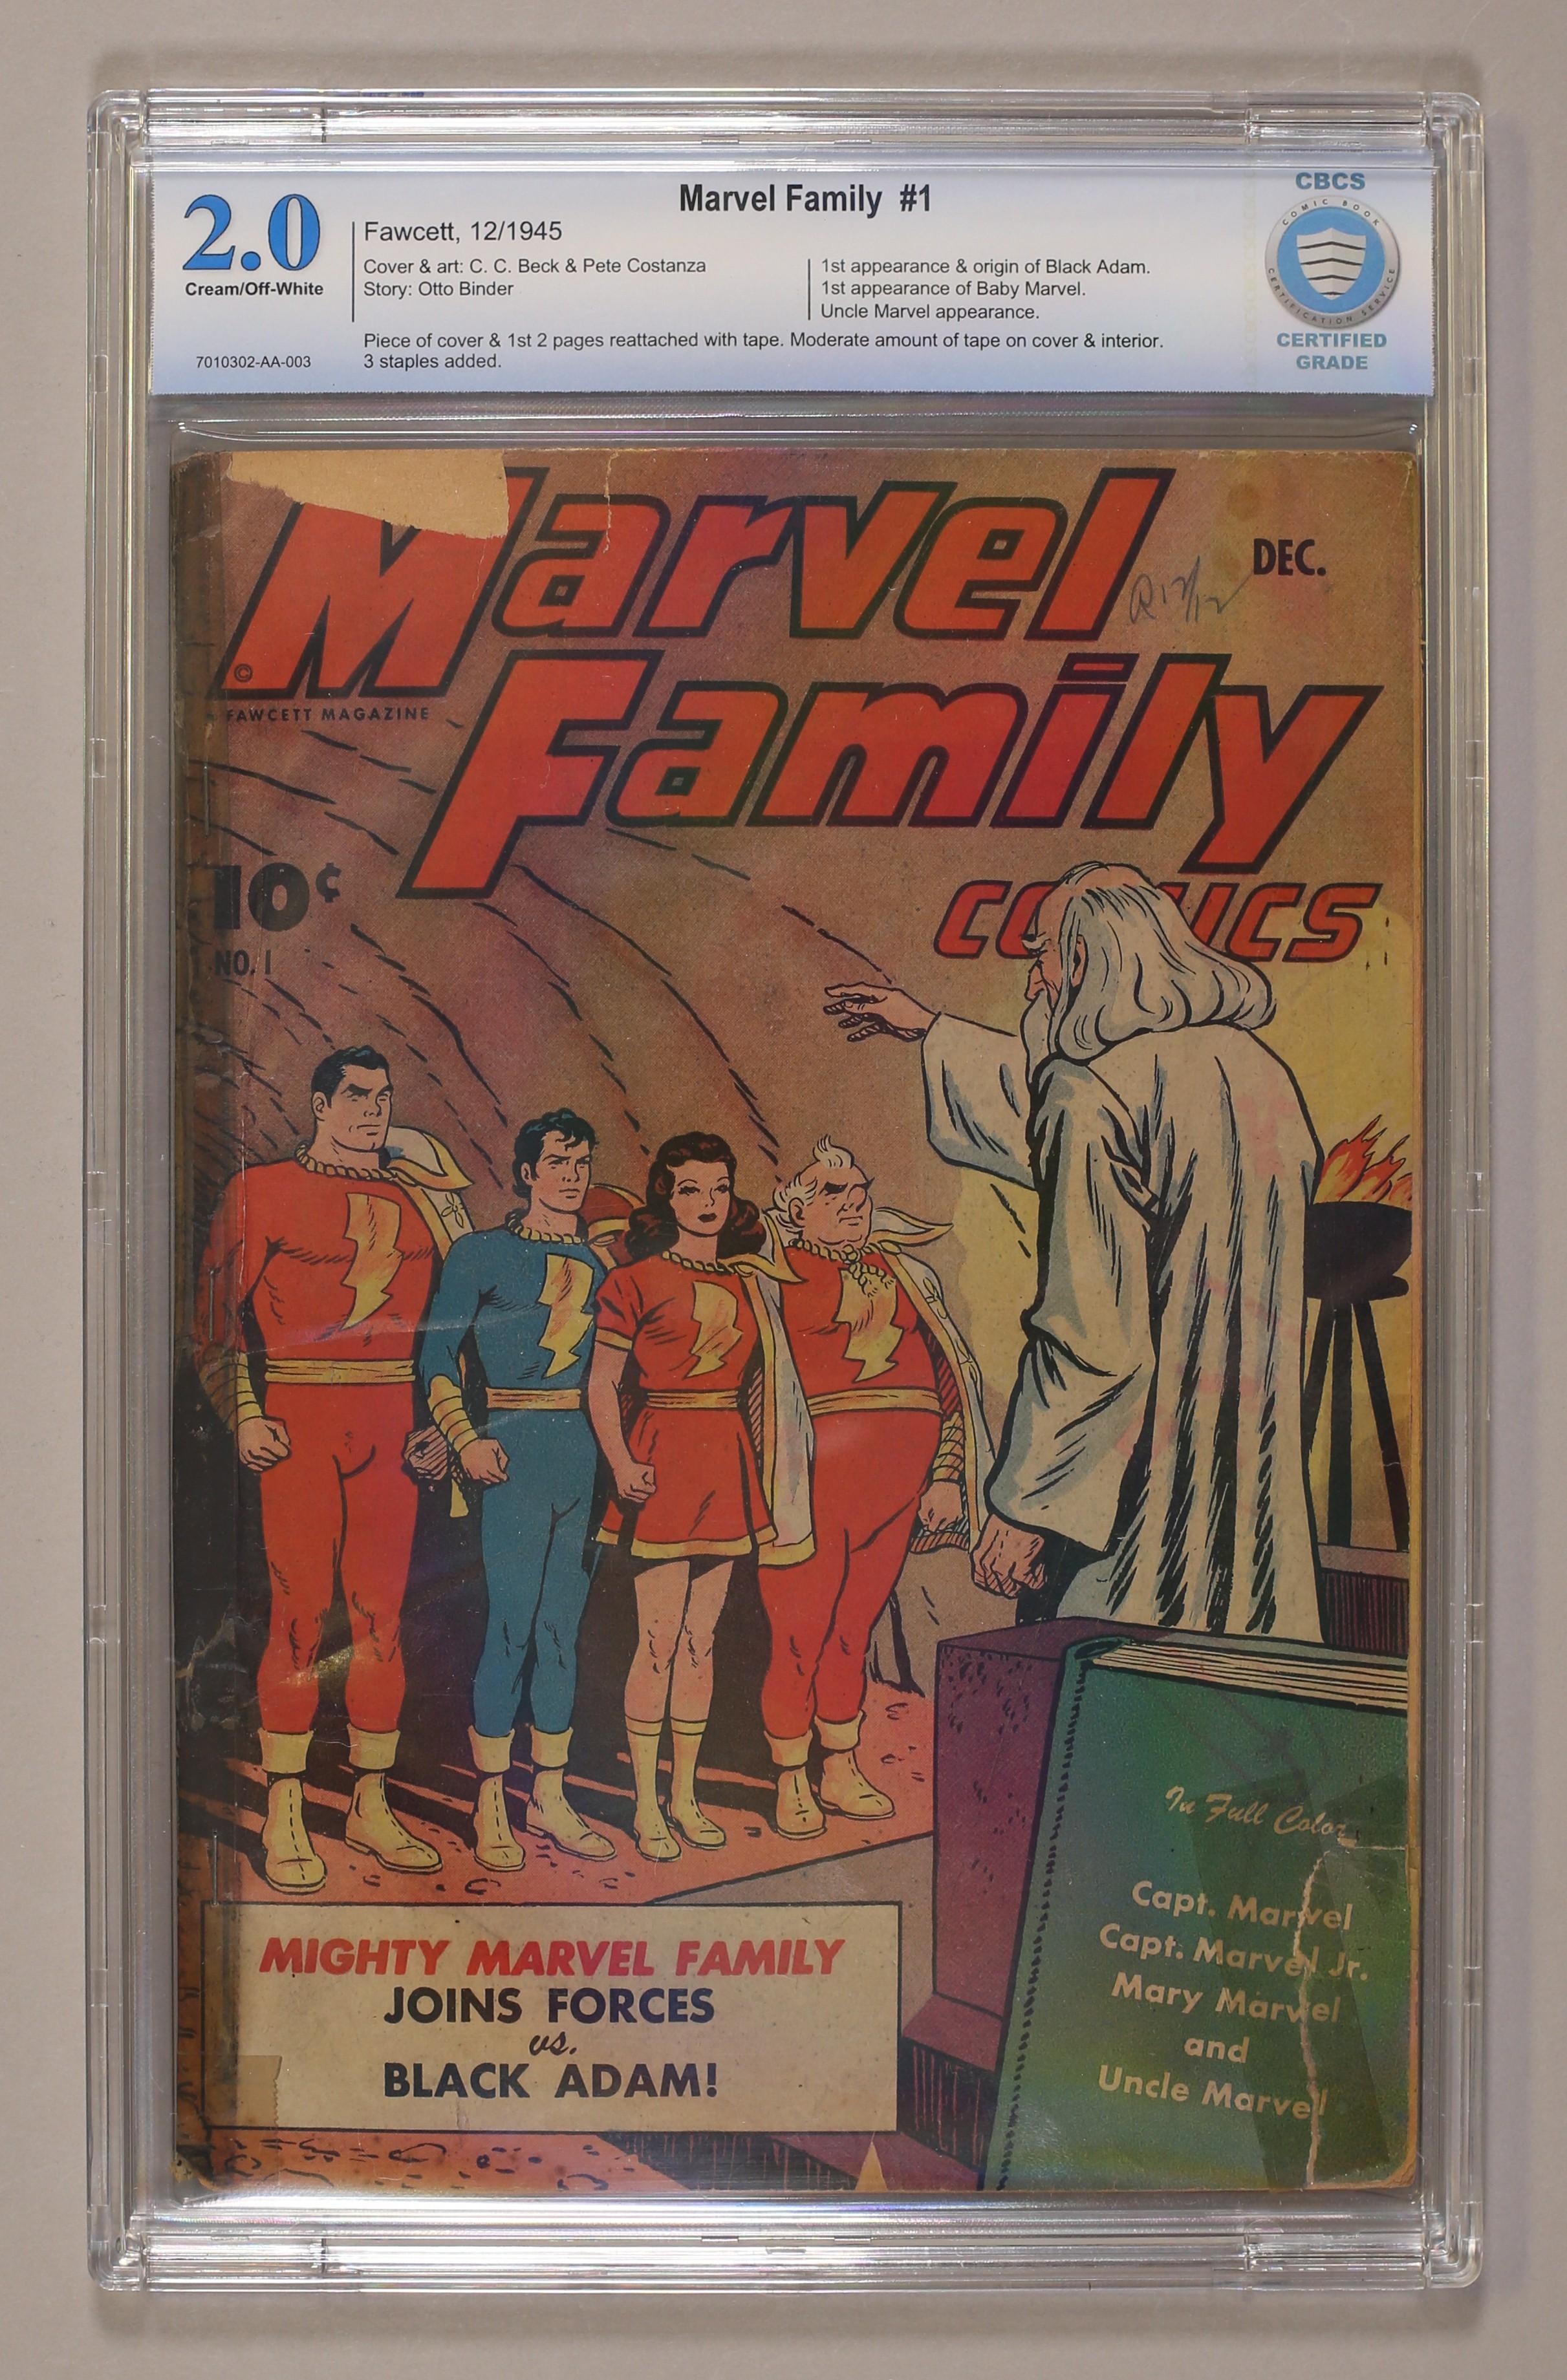 marvel family 1945 comic books graded by cbcs